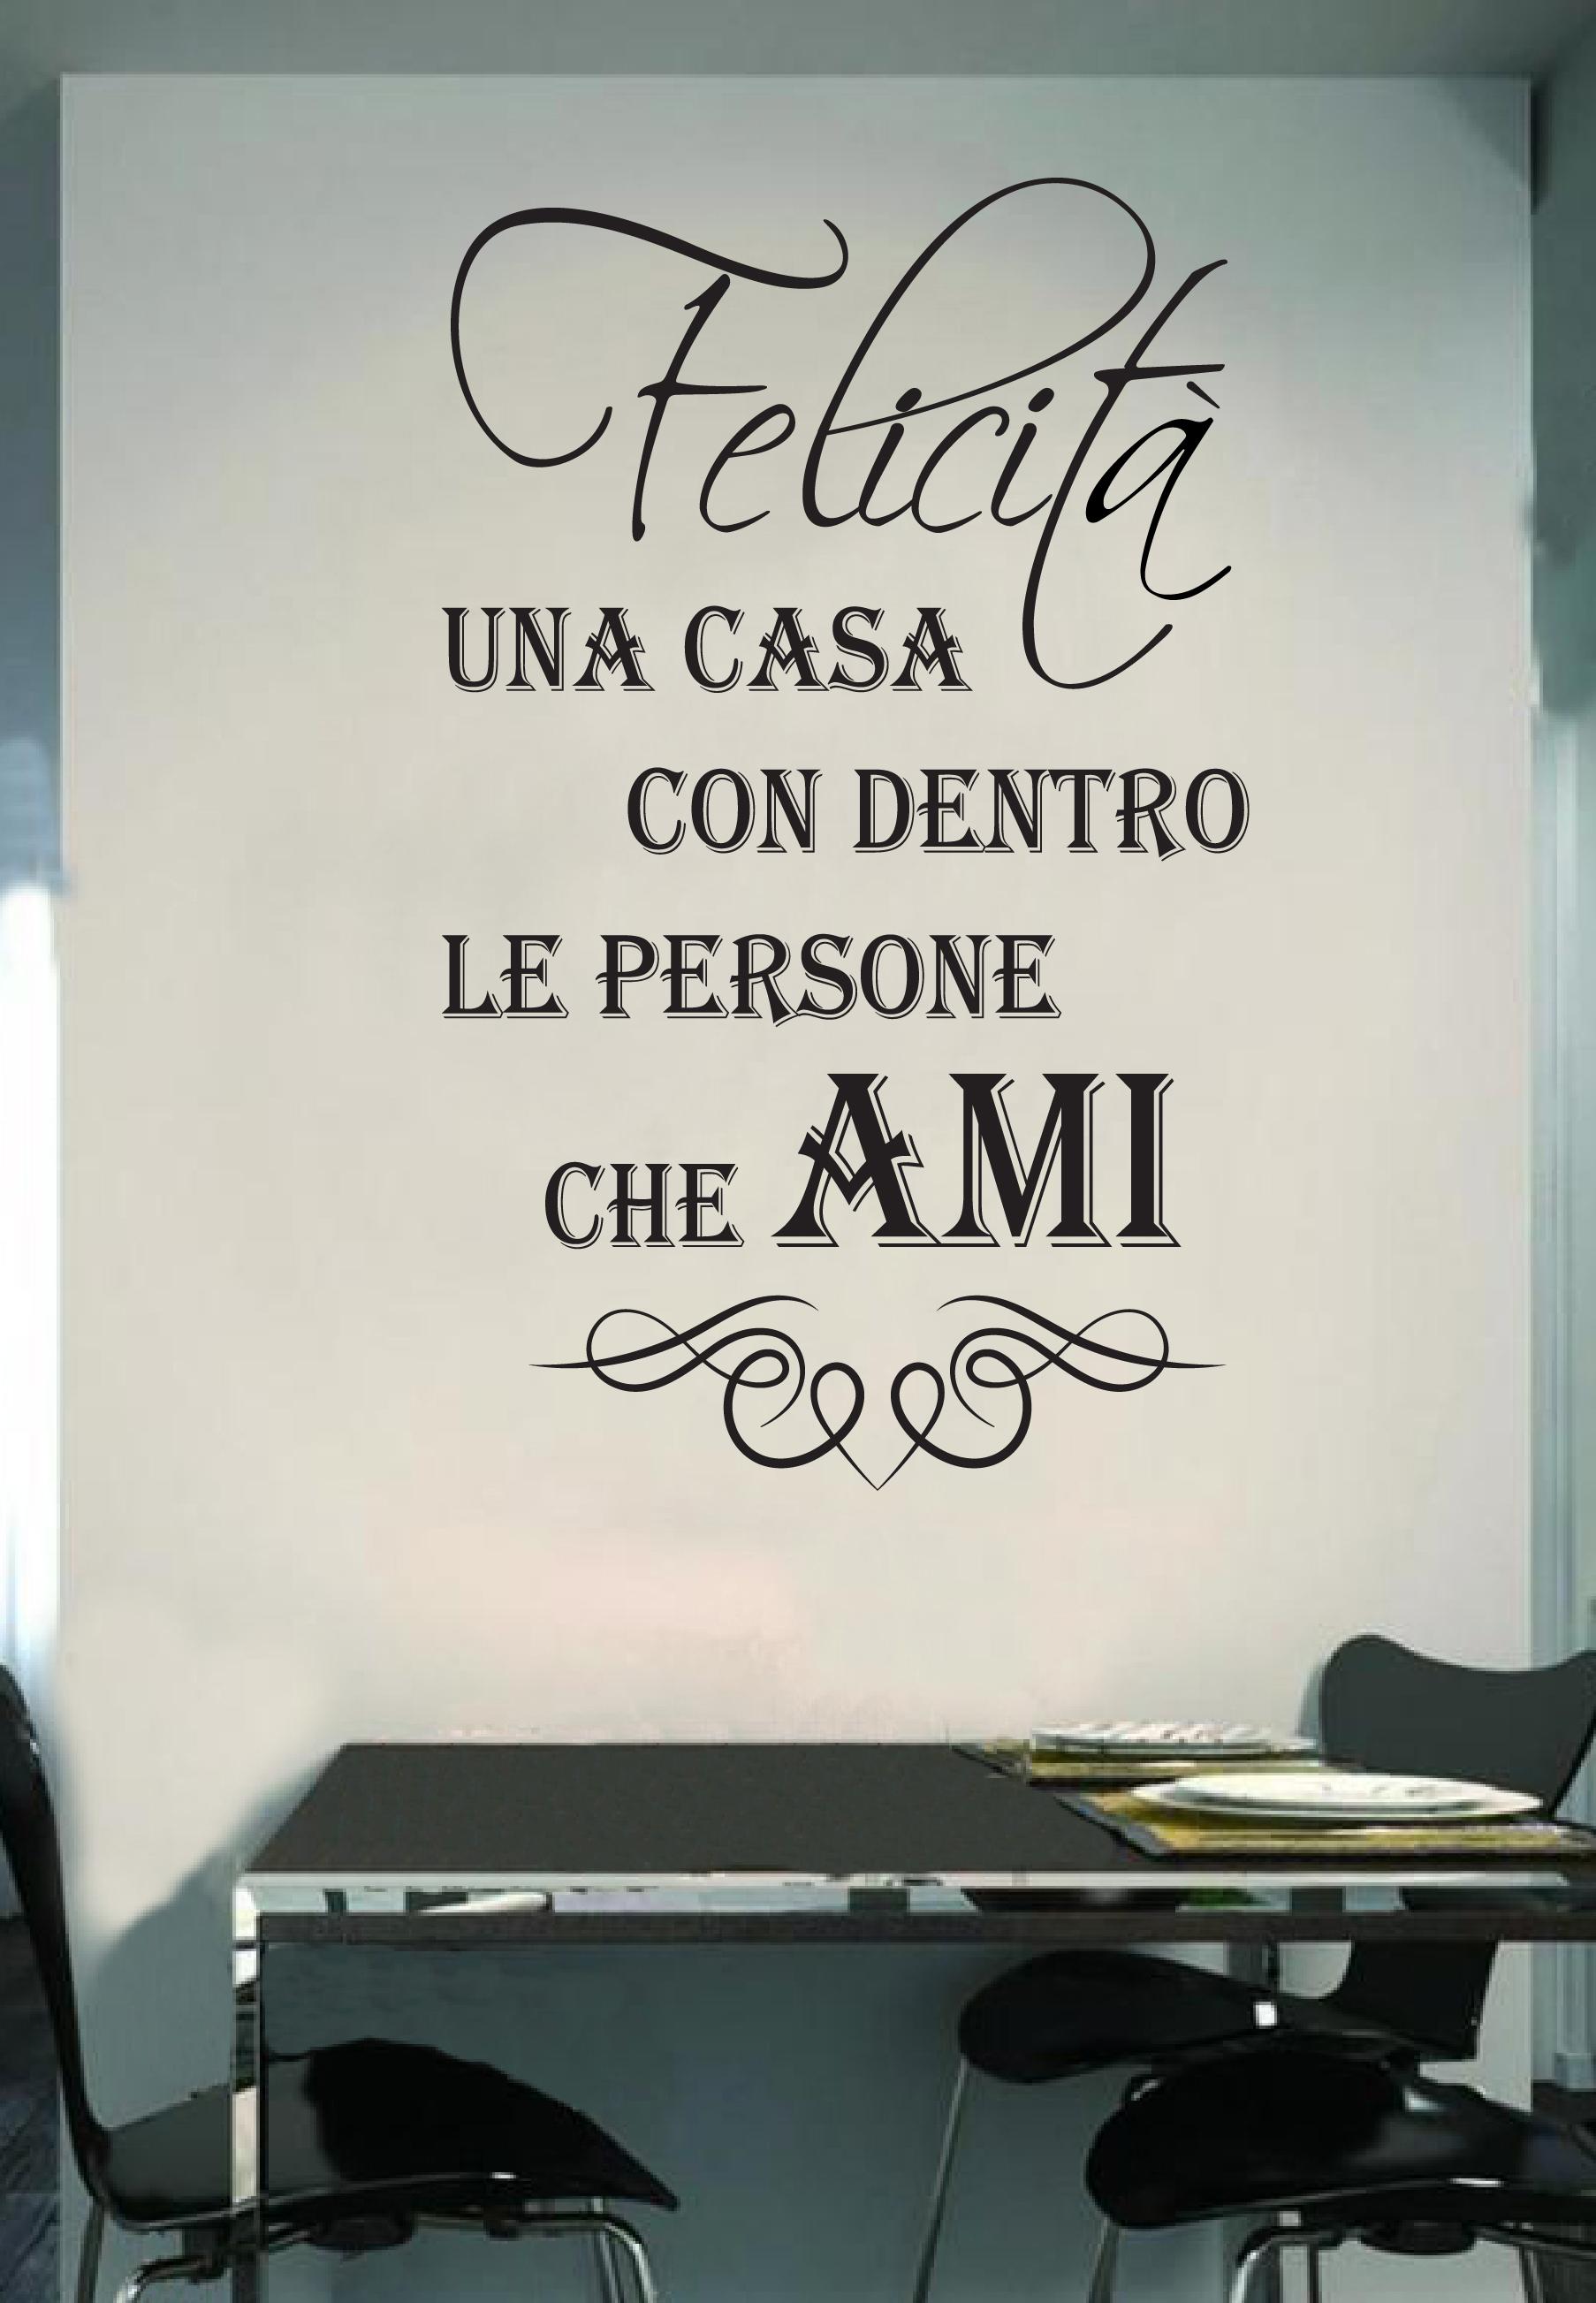 Frasi Felicita Amore.Wall Stickers Murali Felicita Casa Famiglia Love Amore Muro Adesivo Frase Ebay